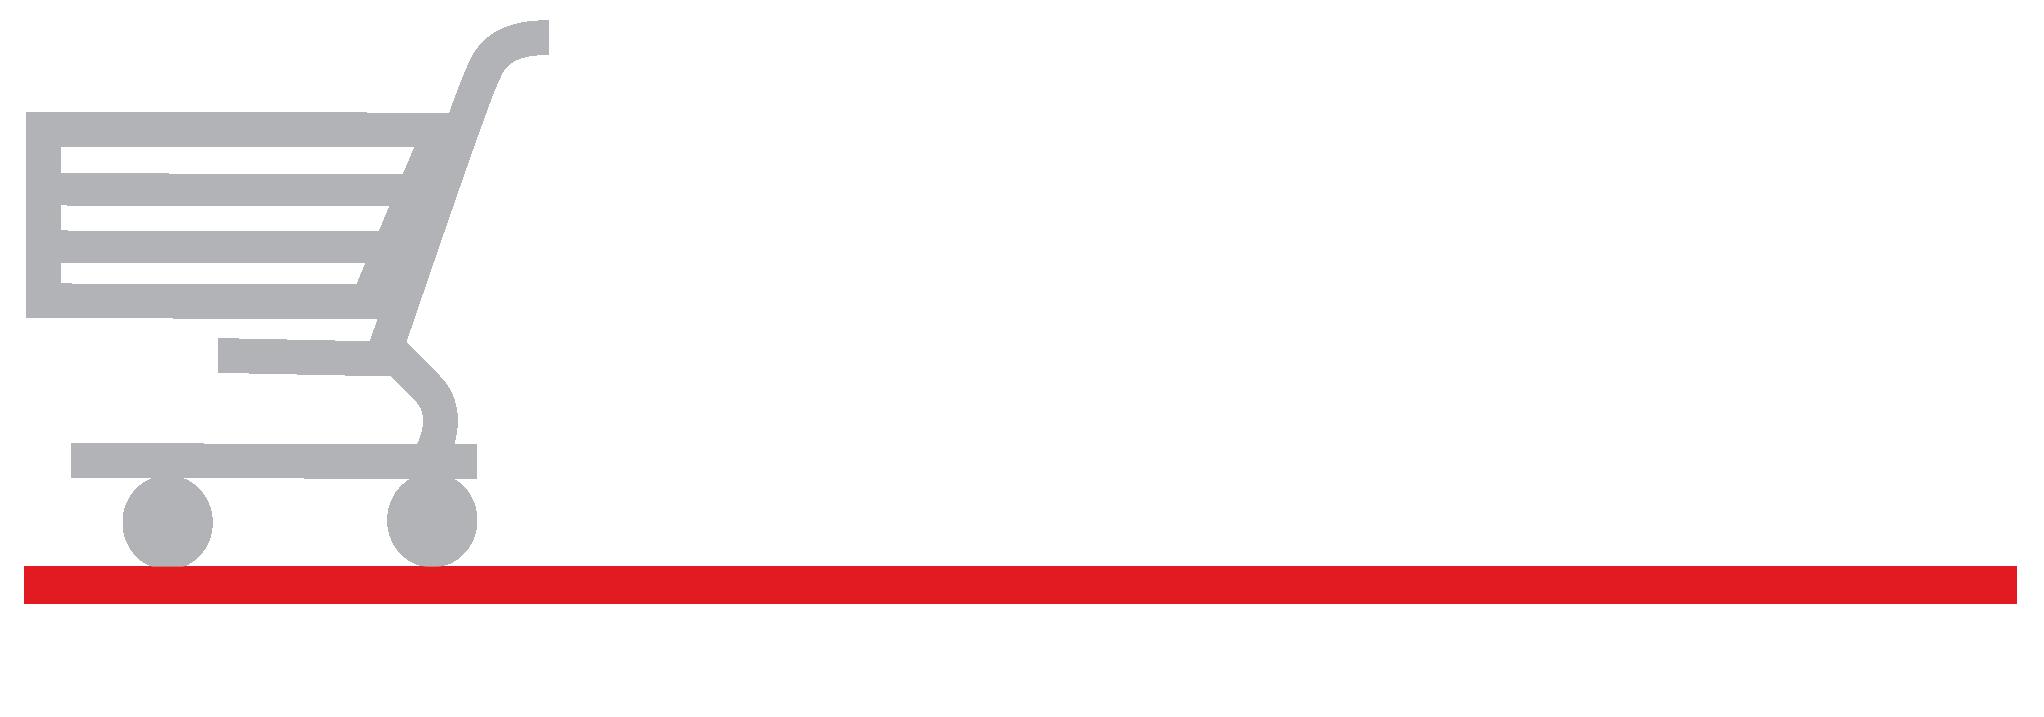 OSMG_no name Logo White-01.png